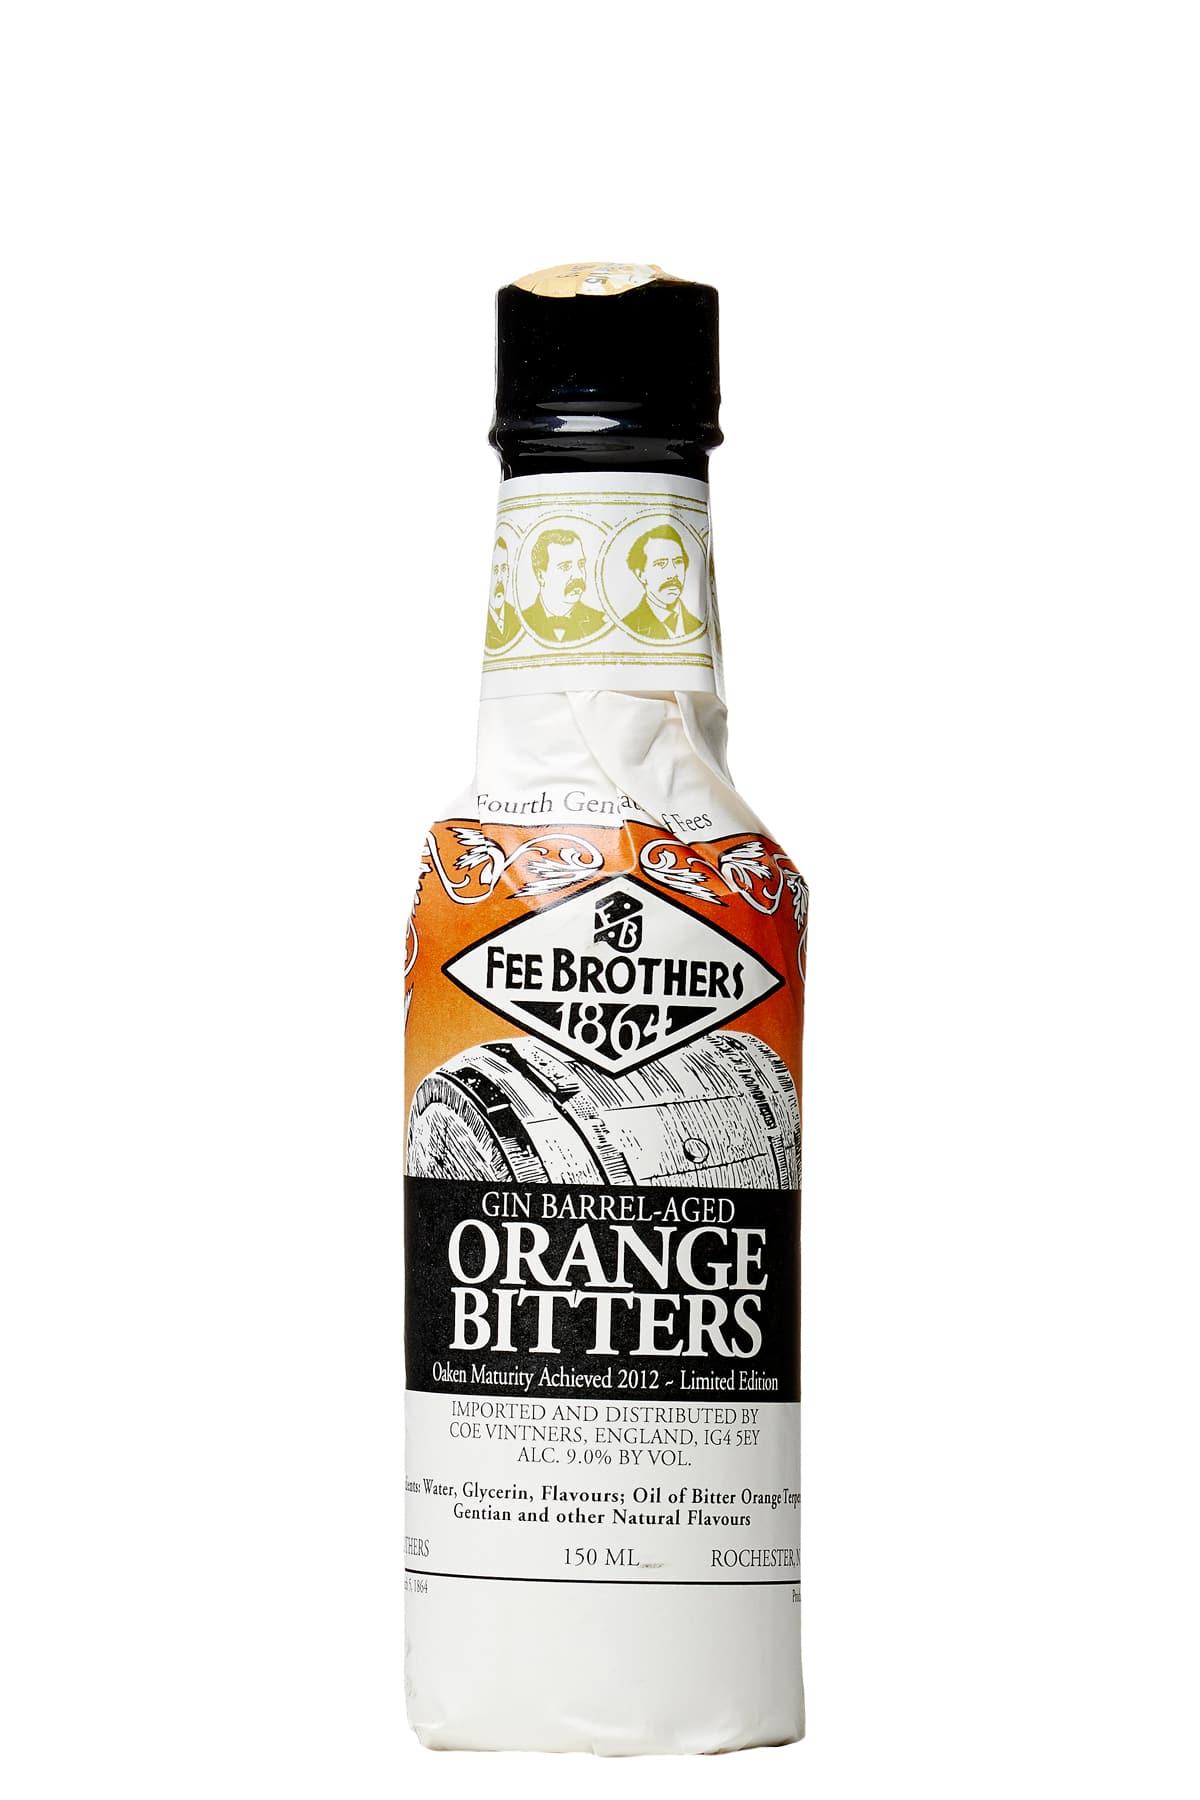 Fee Brothers Gin Barrel Aged Orange